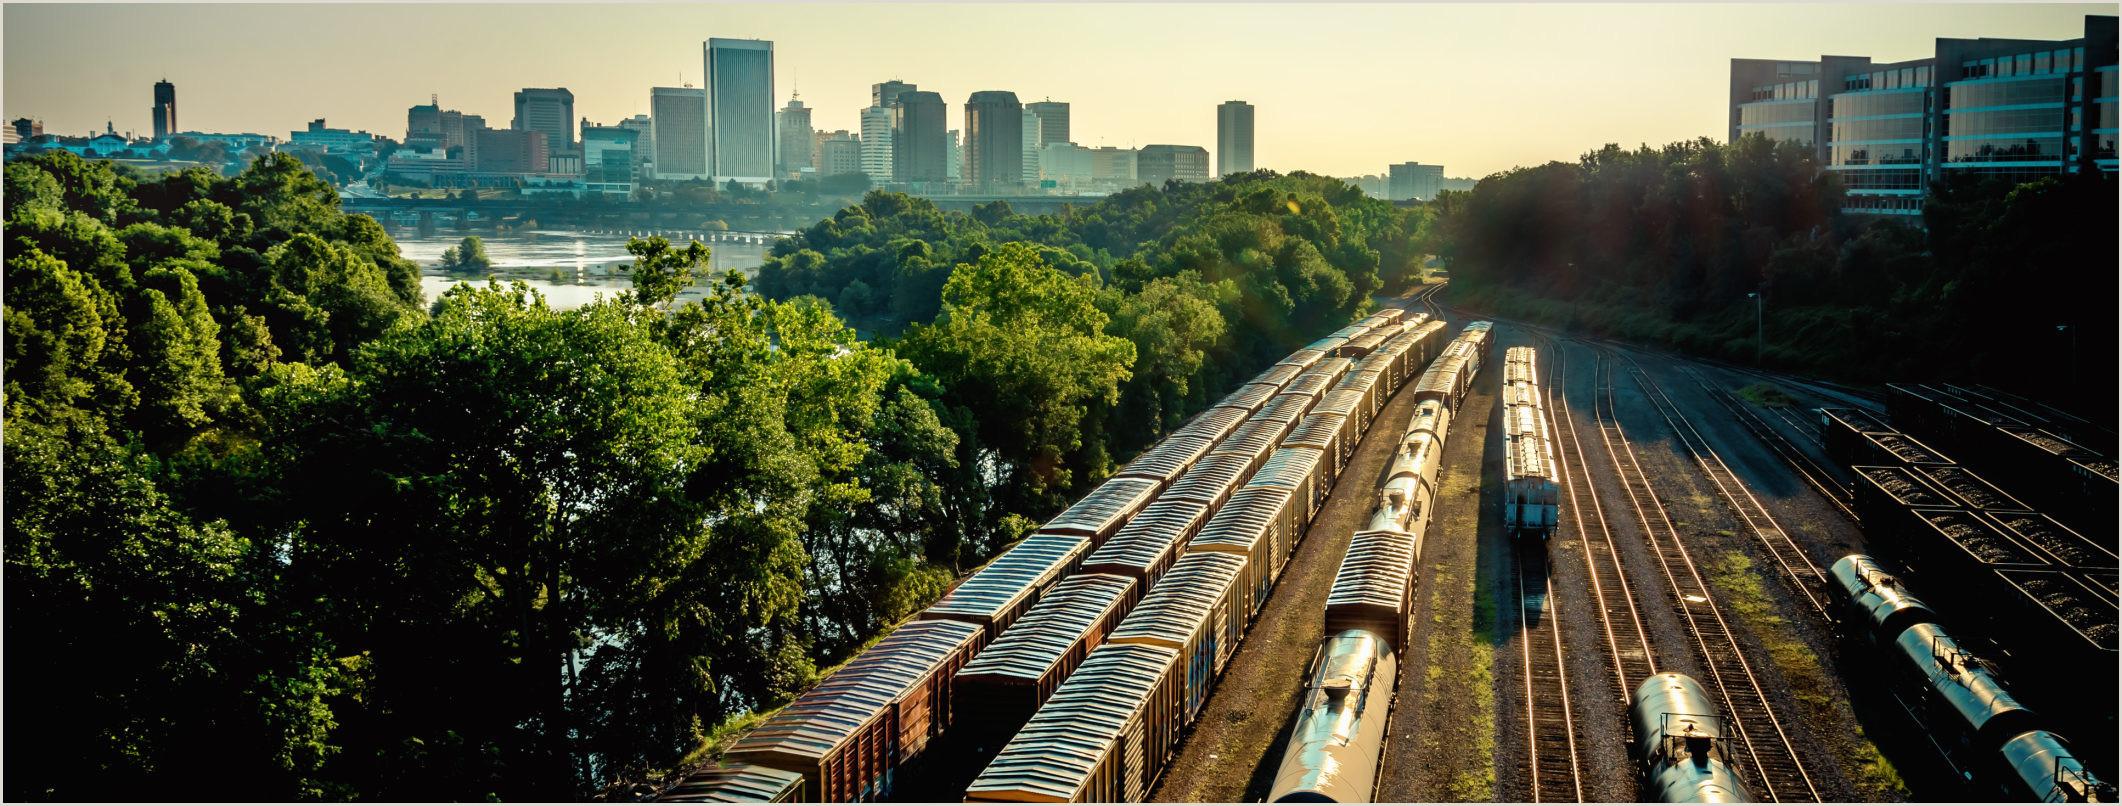 Railroad 101 Association of American Railroads